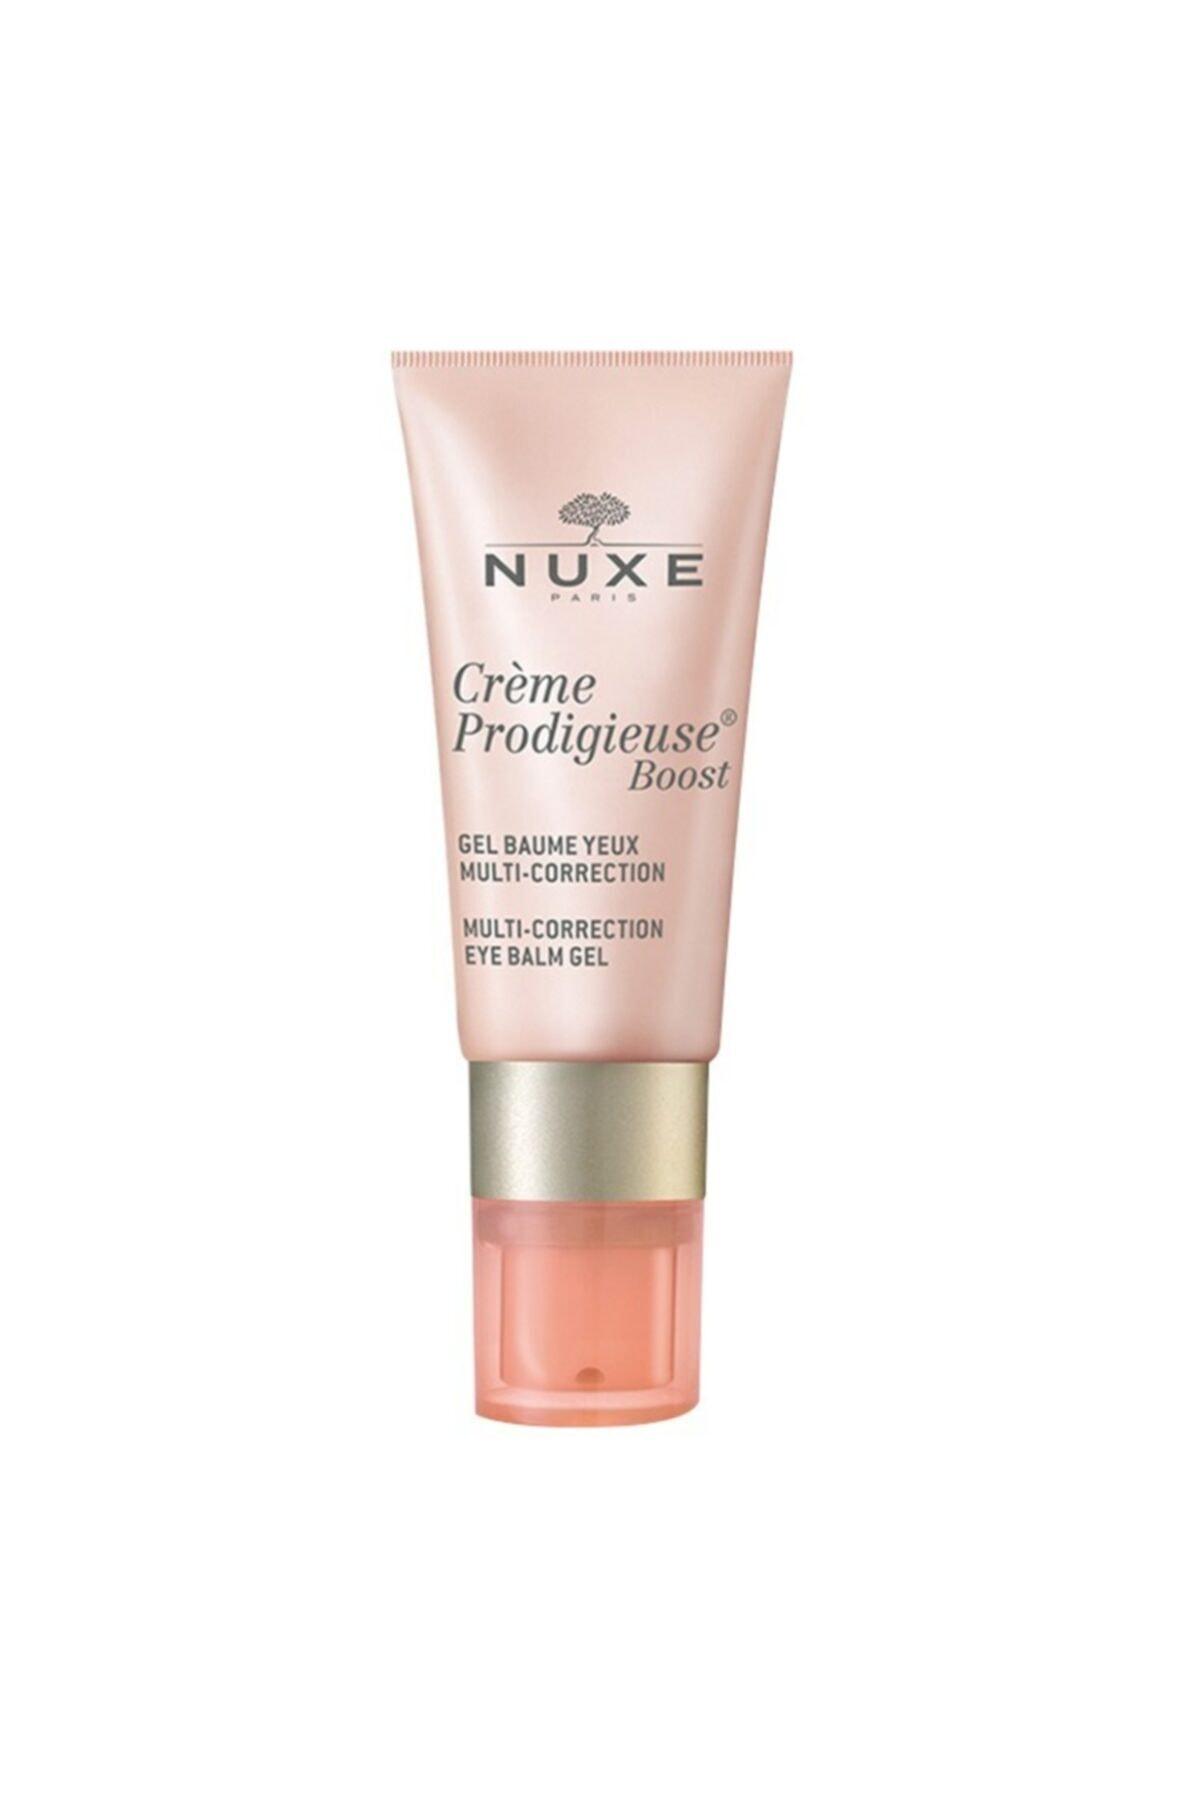 Nuxe Creme Prodigieuse Boost Multi Correction Eye Balm Gel 15 ml 1